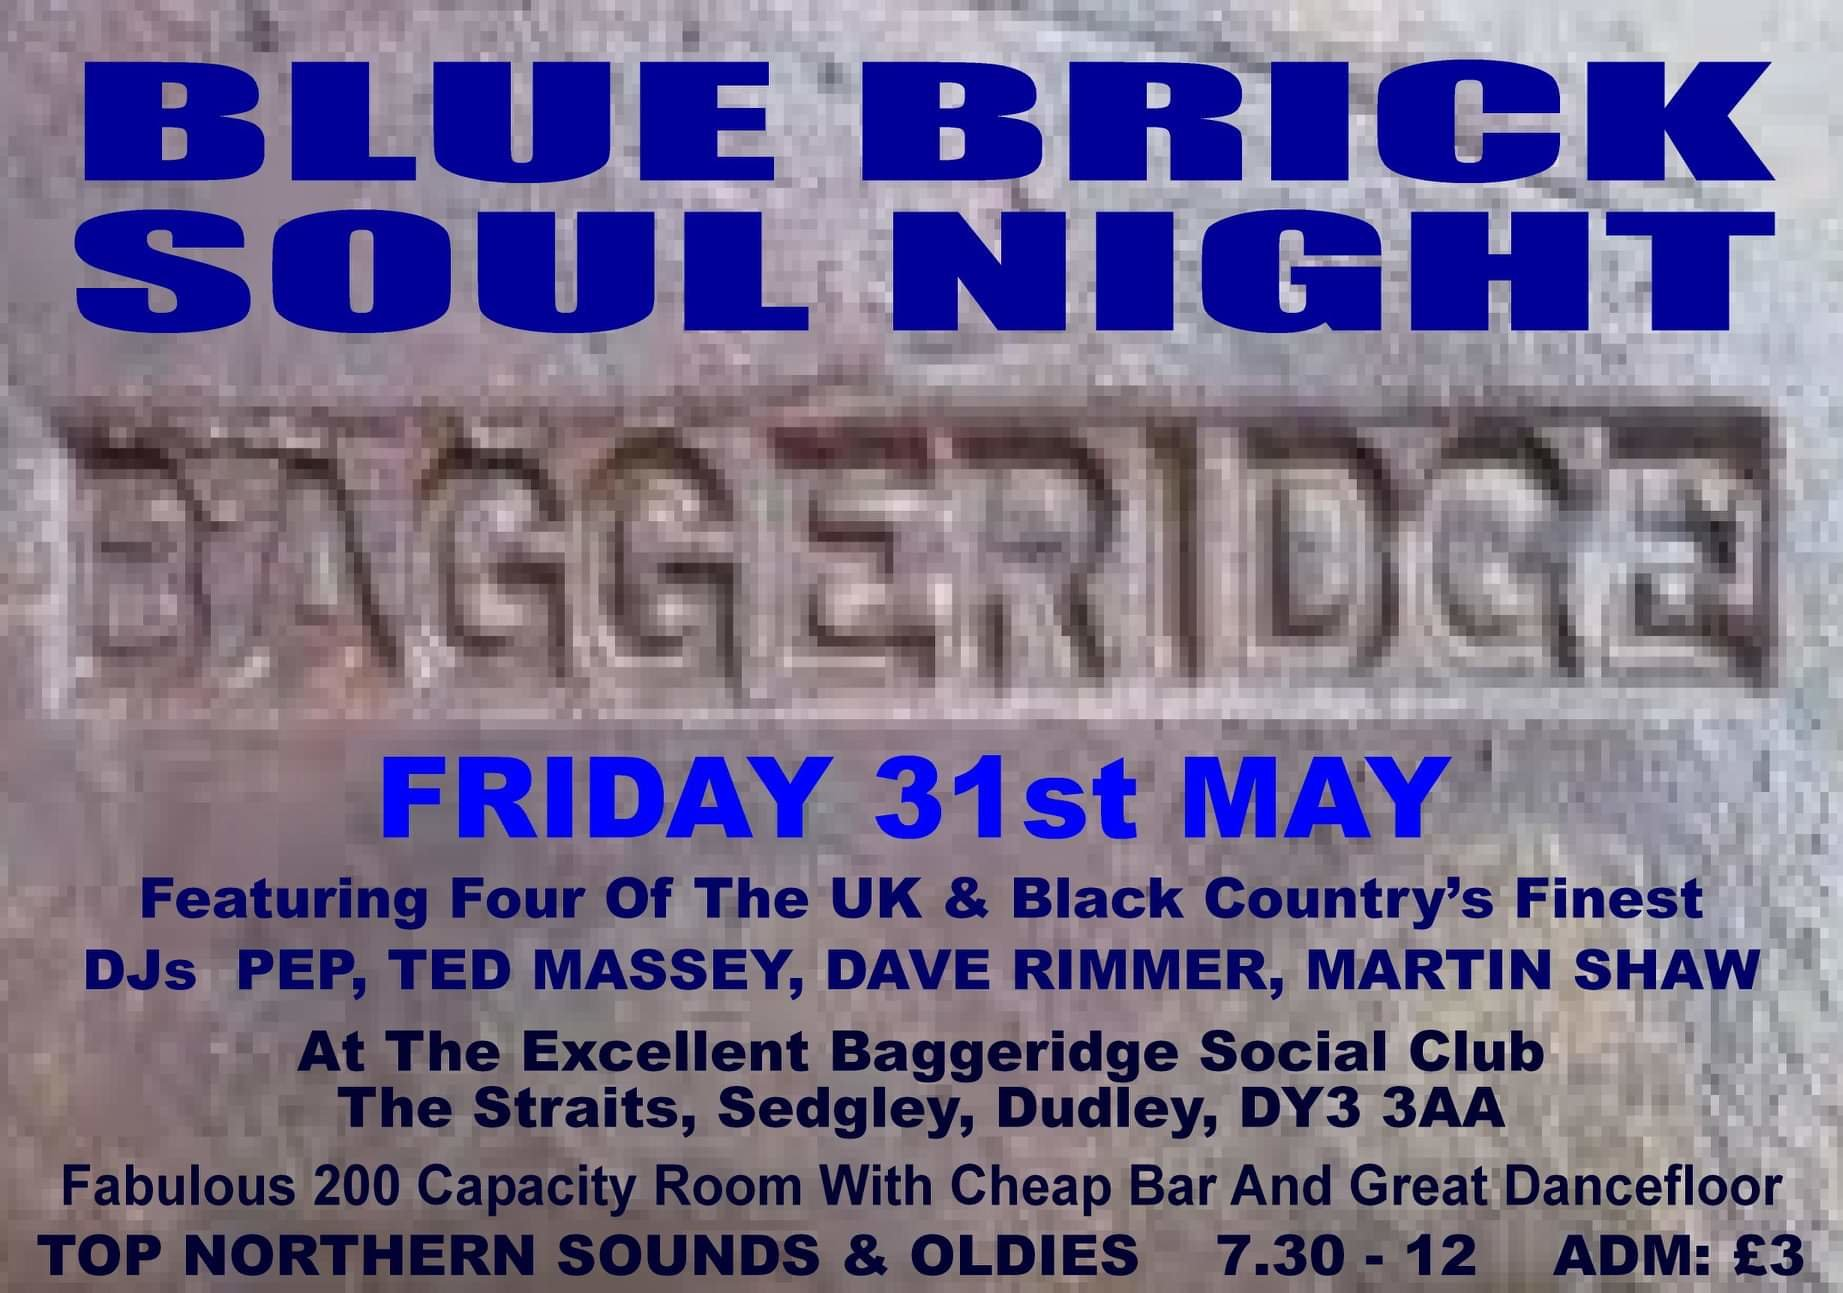 Baggeridge Soul Night flyer